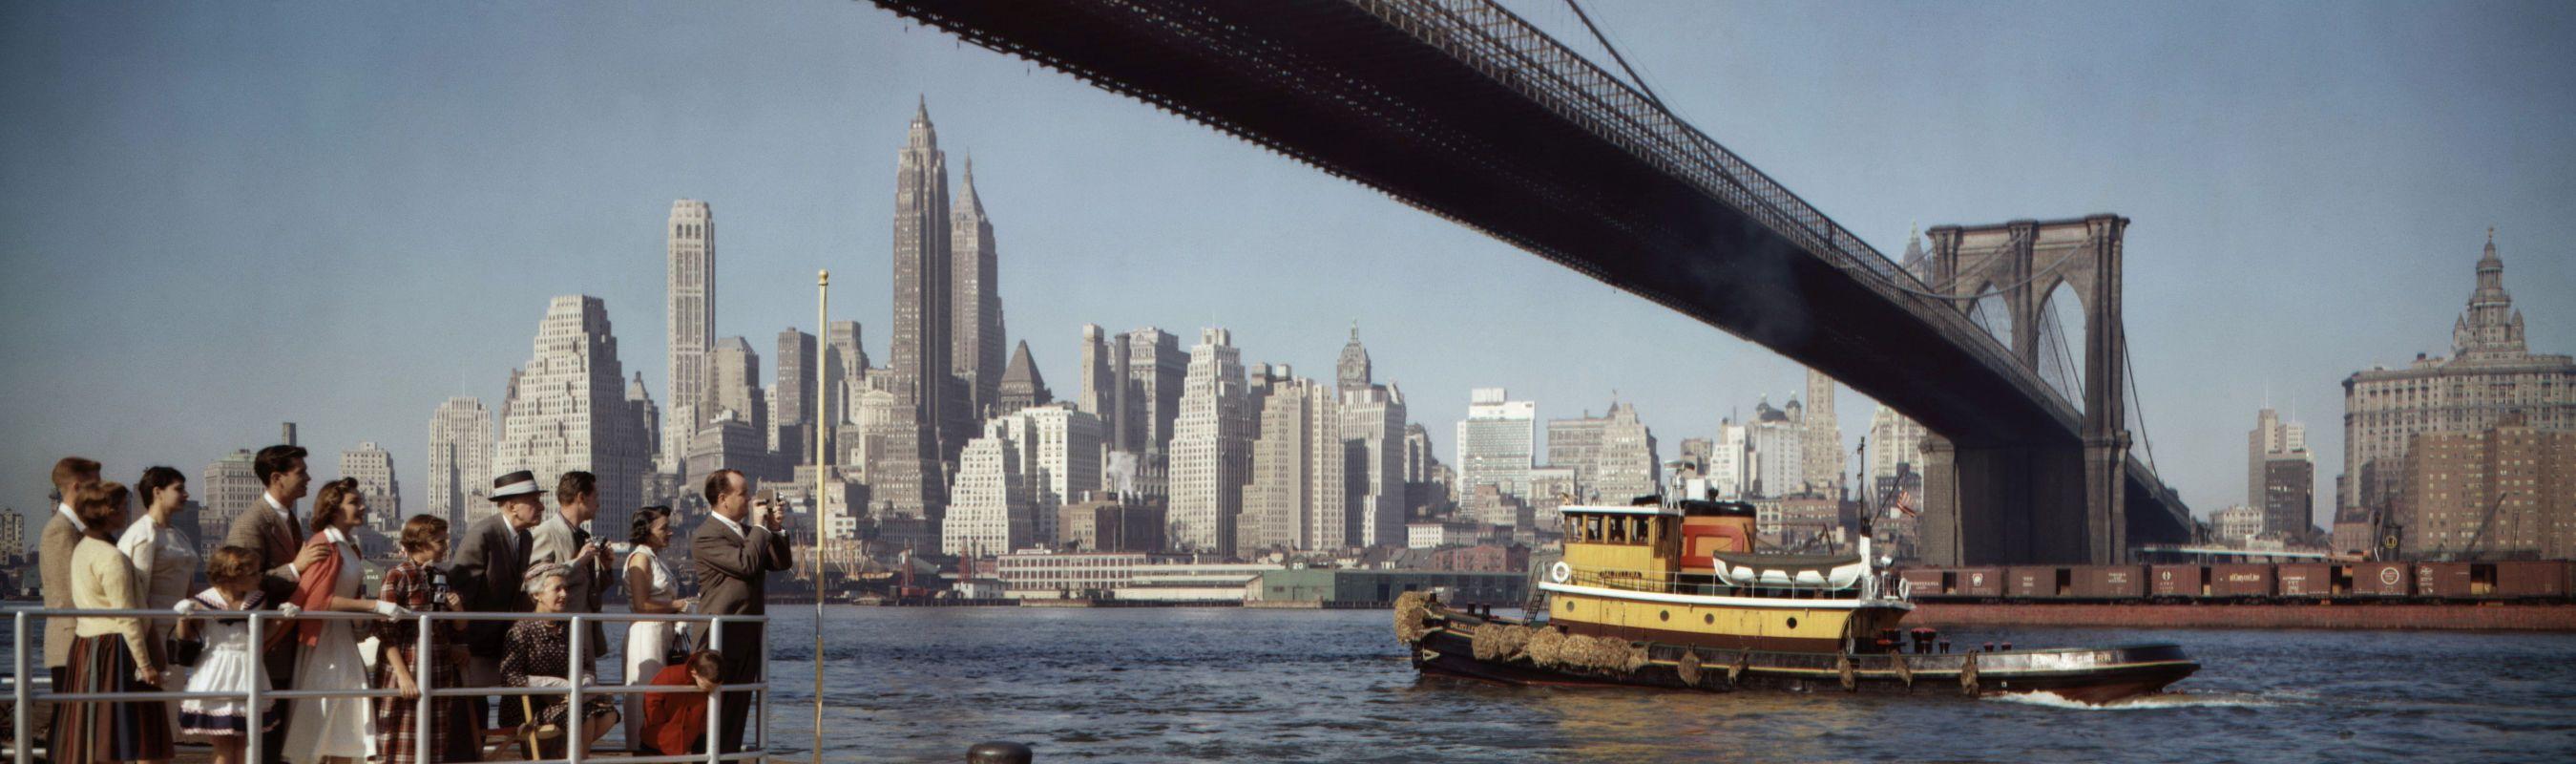 tugboat-under-brooklyn-bridge-new-york-city-1958-colorama-137-c2bd-kodak-_1.jpg